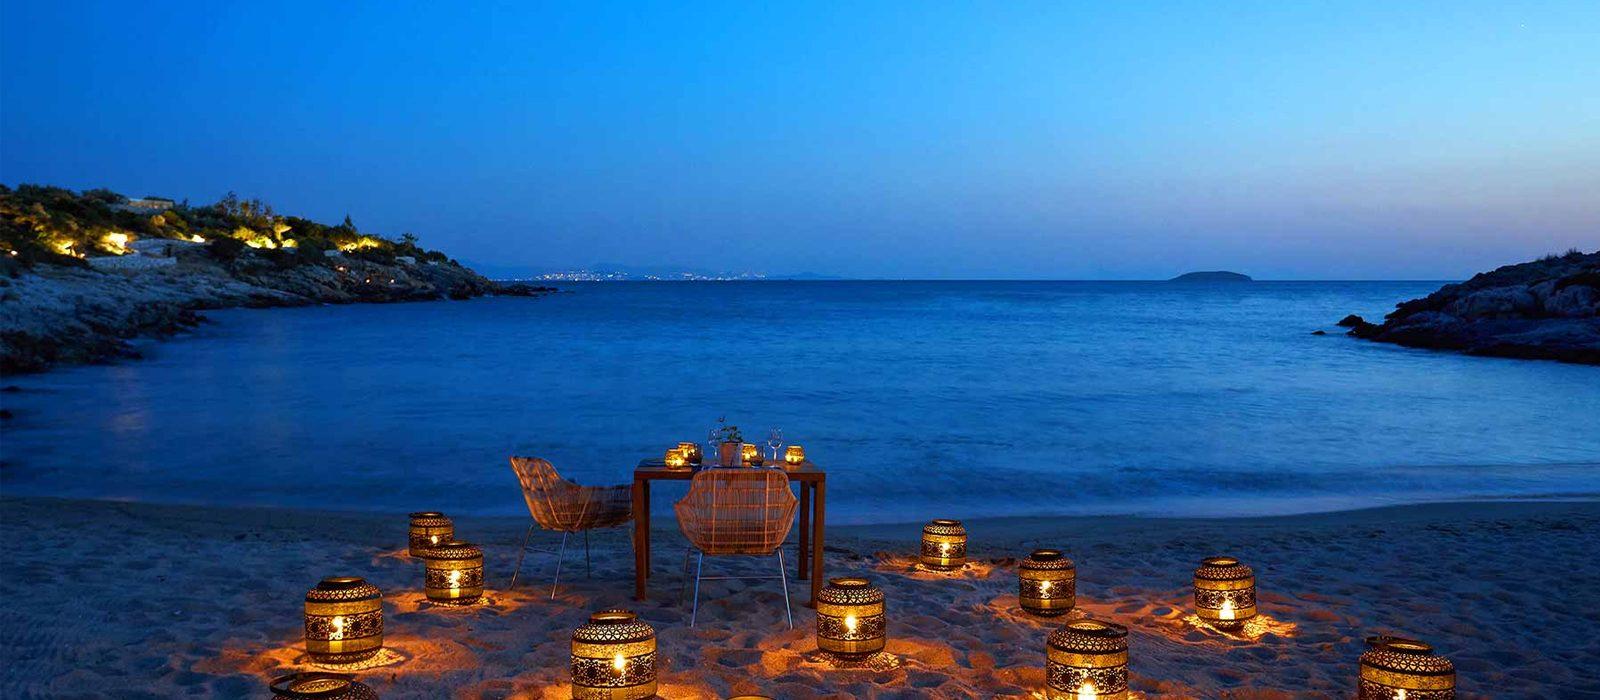 Luxury Turkey Holiday Packages Six Senses Kaplankaya Header